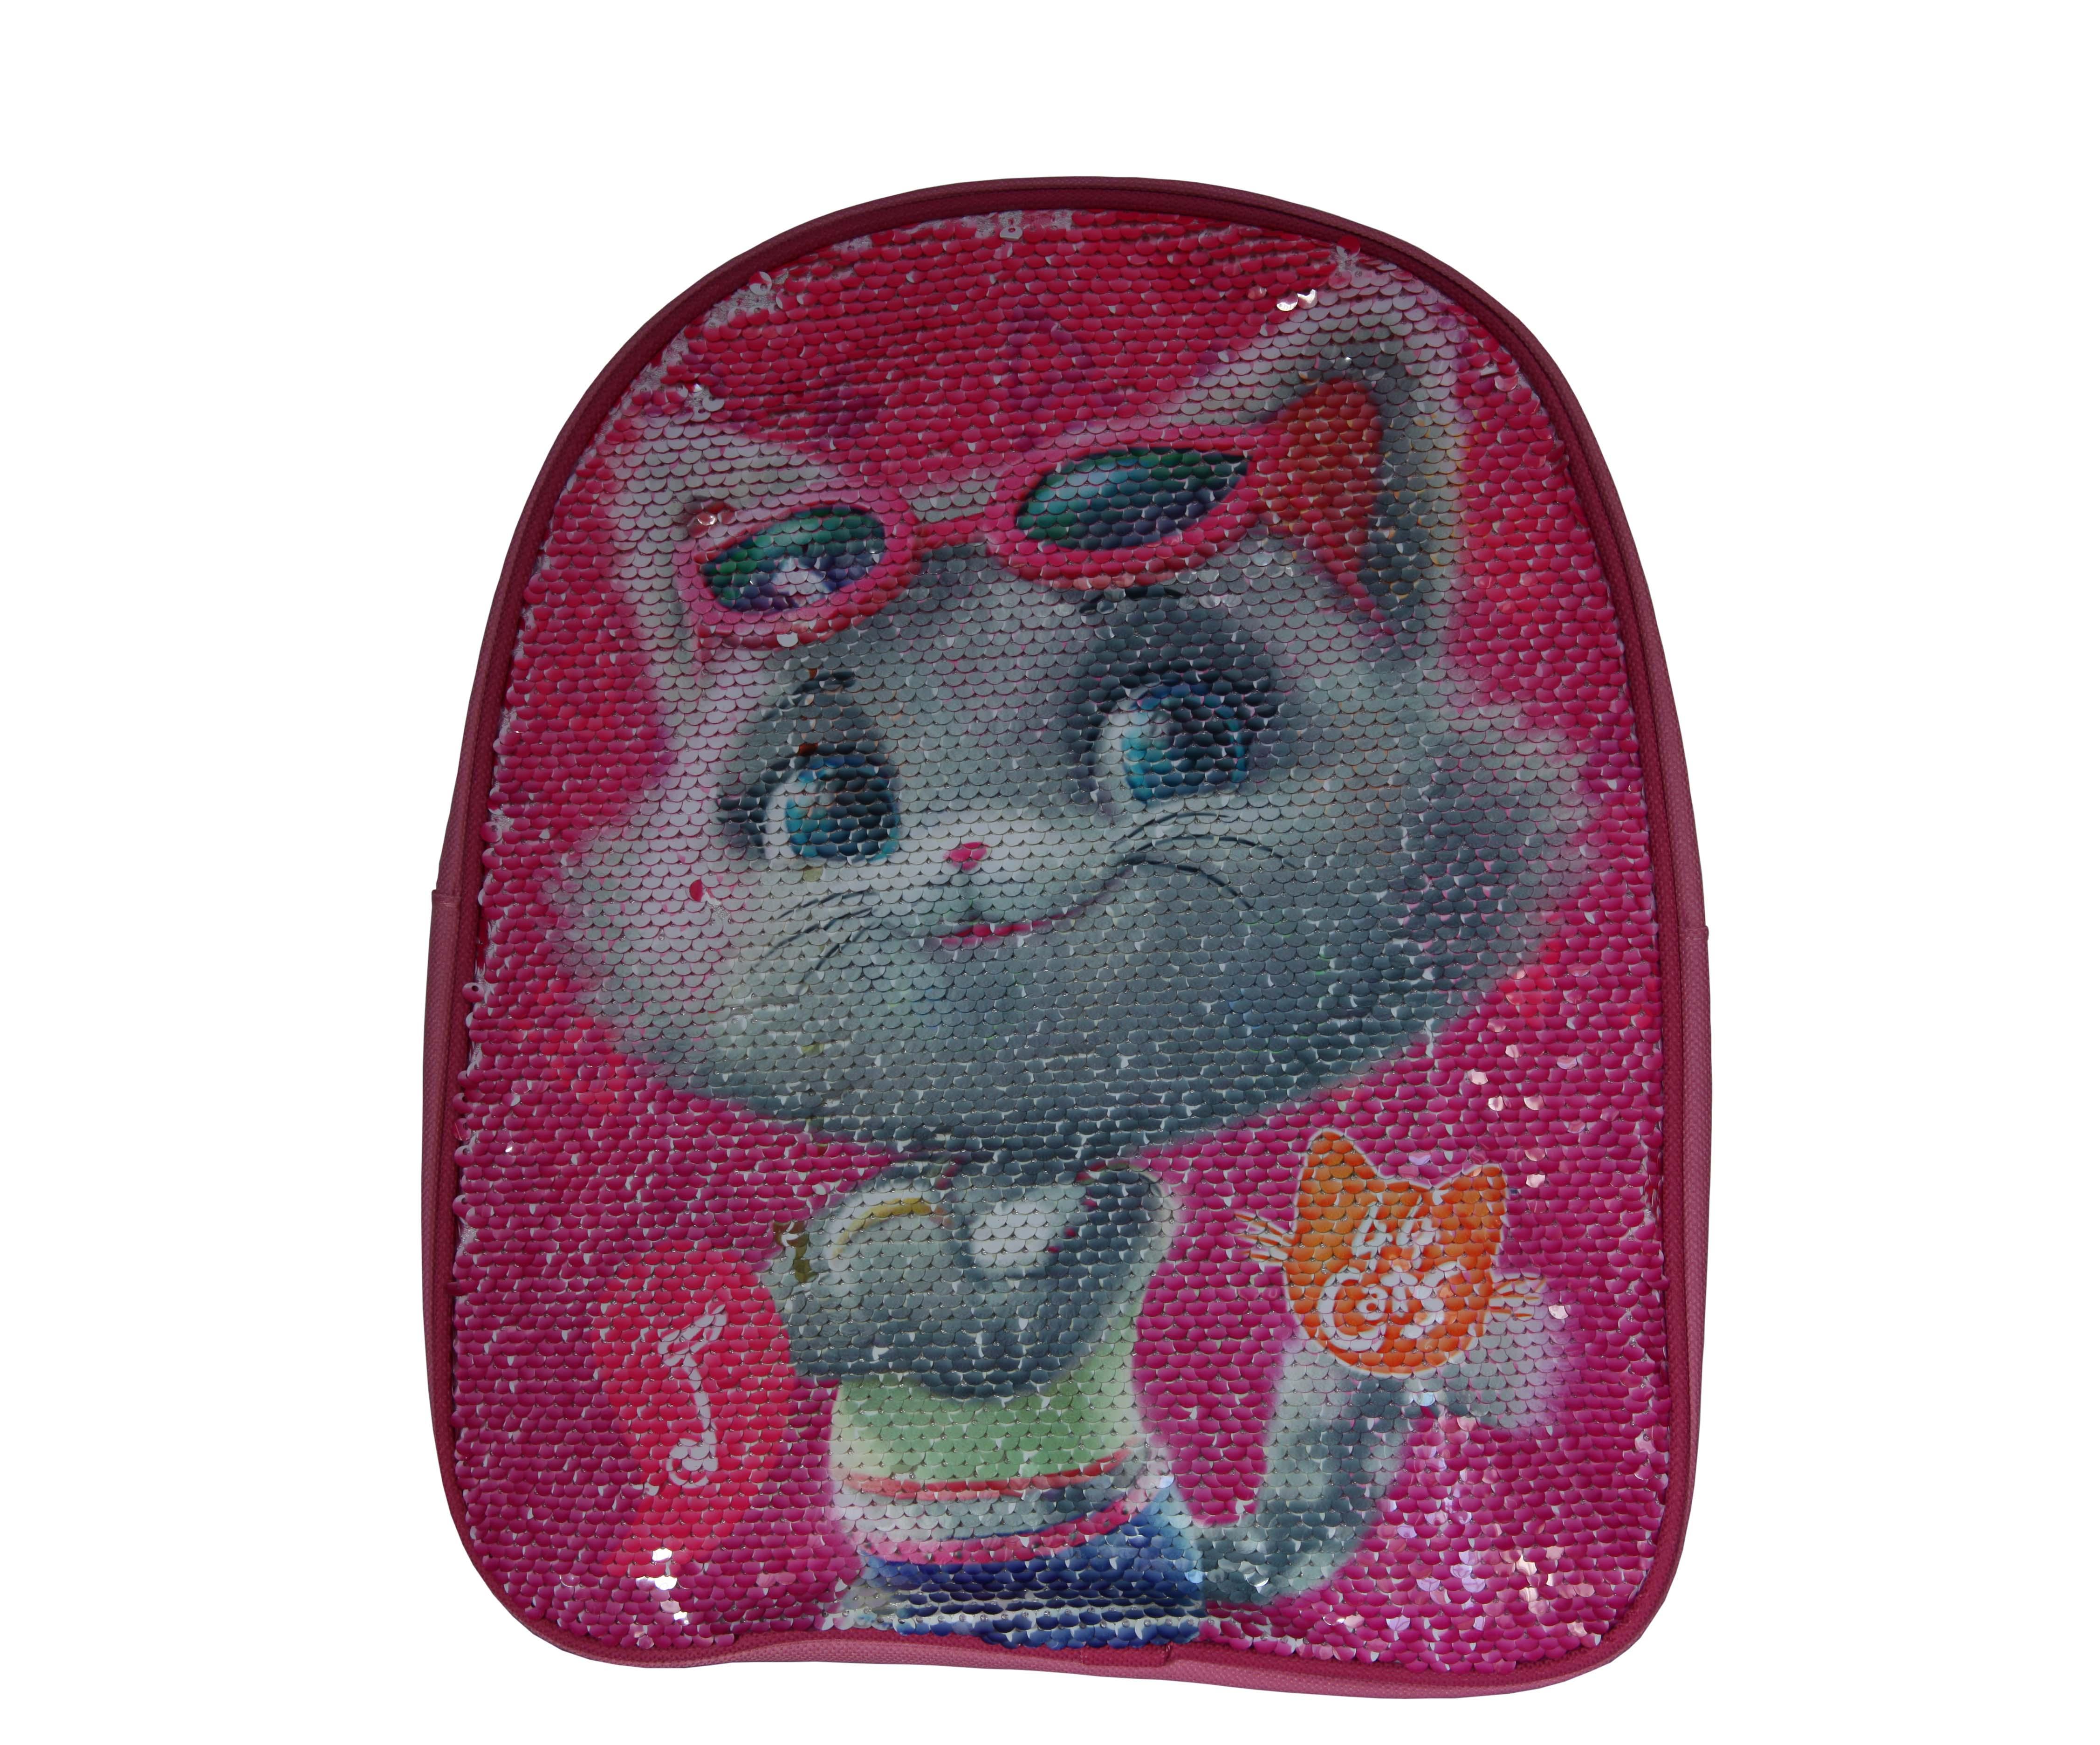 Ghiozdan gradinita cu paiete reversibile 44 Cats, roz 30x26x10 cm 1